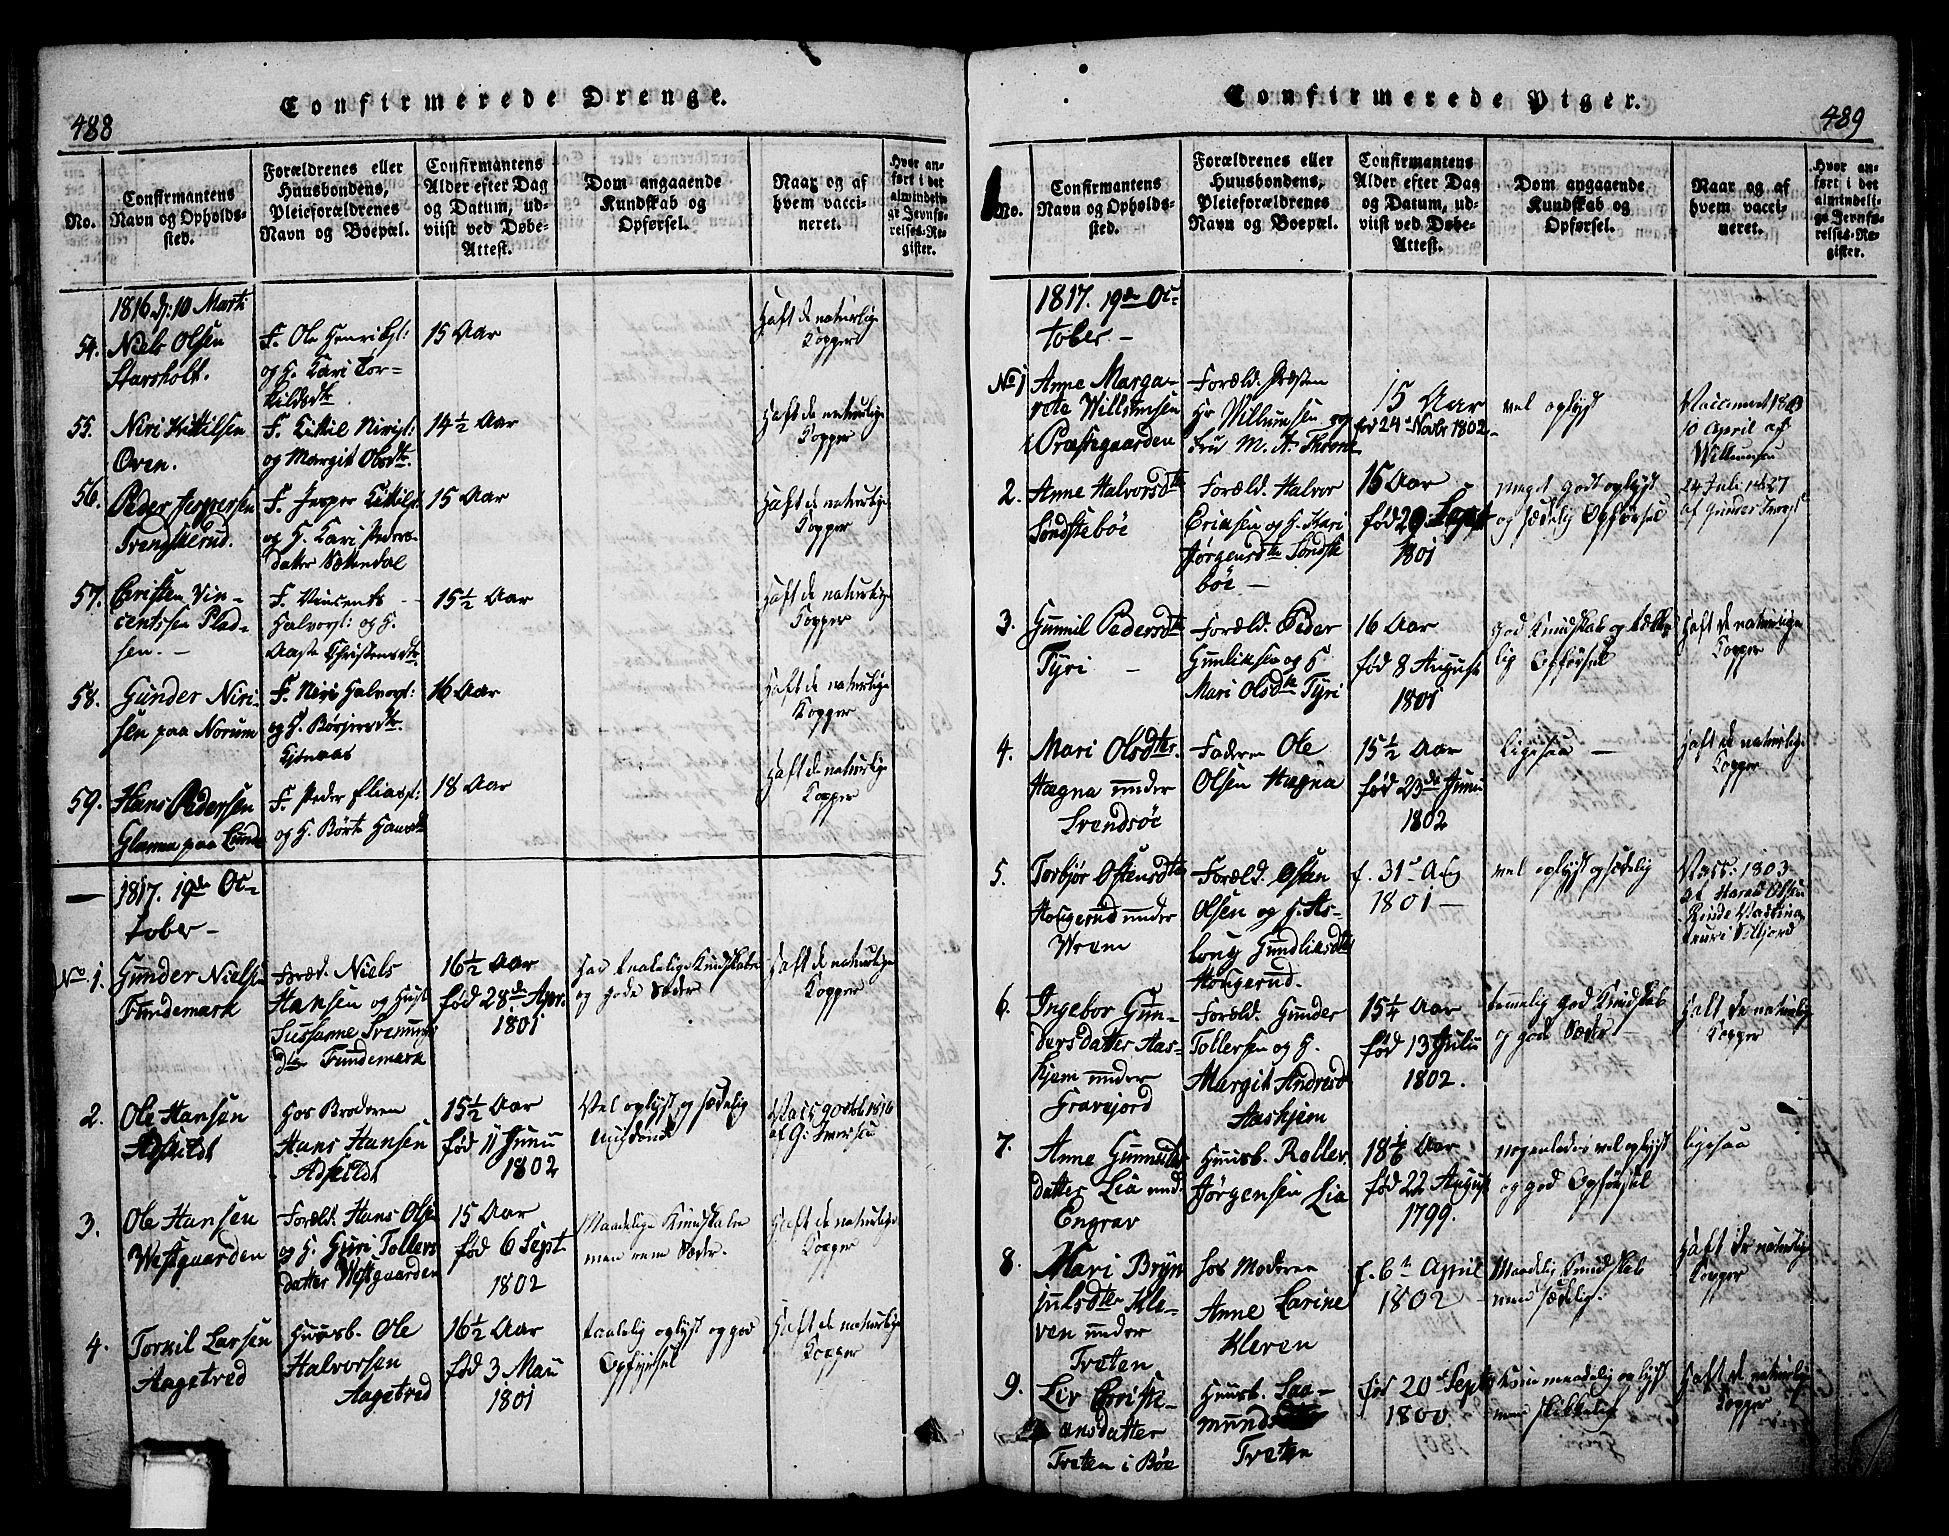 SAKO, Bø kirkebøker, G/Ga/L0001: Klokkerbok nr. 1, 1815-1831, s. 488-489